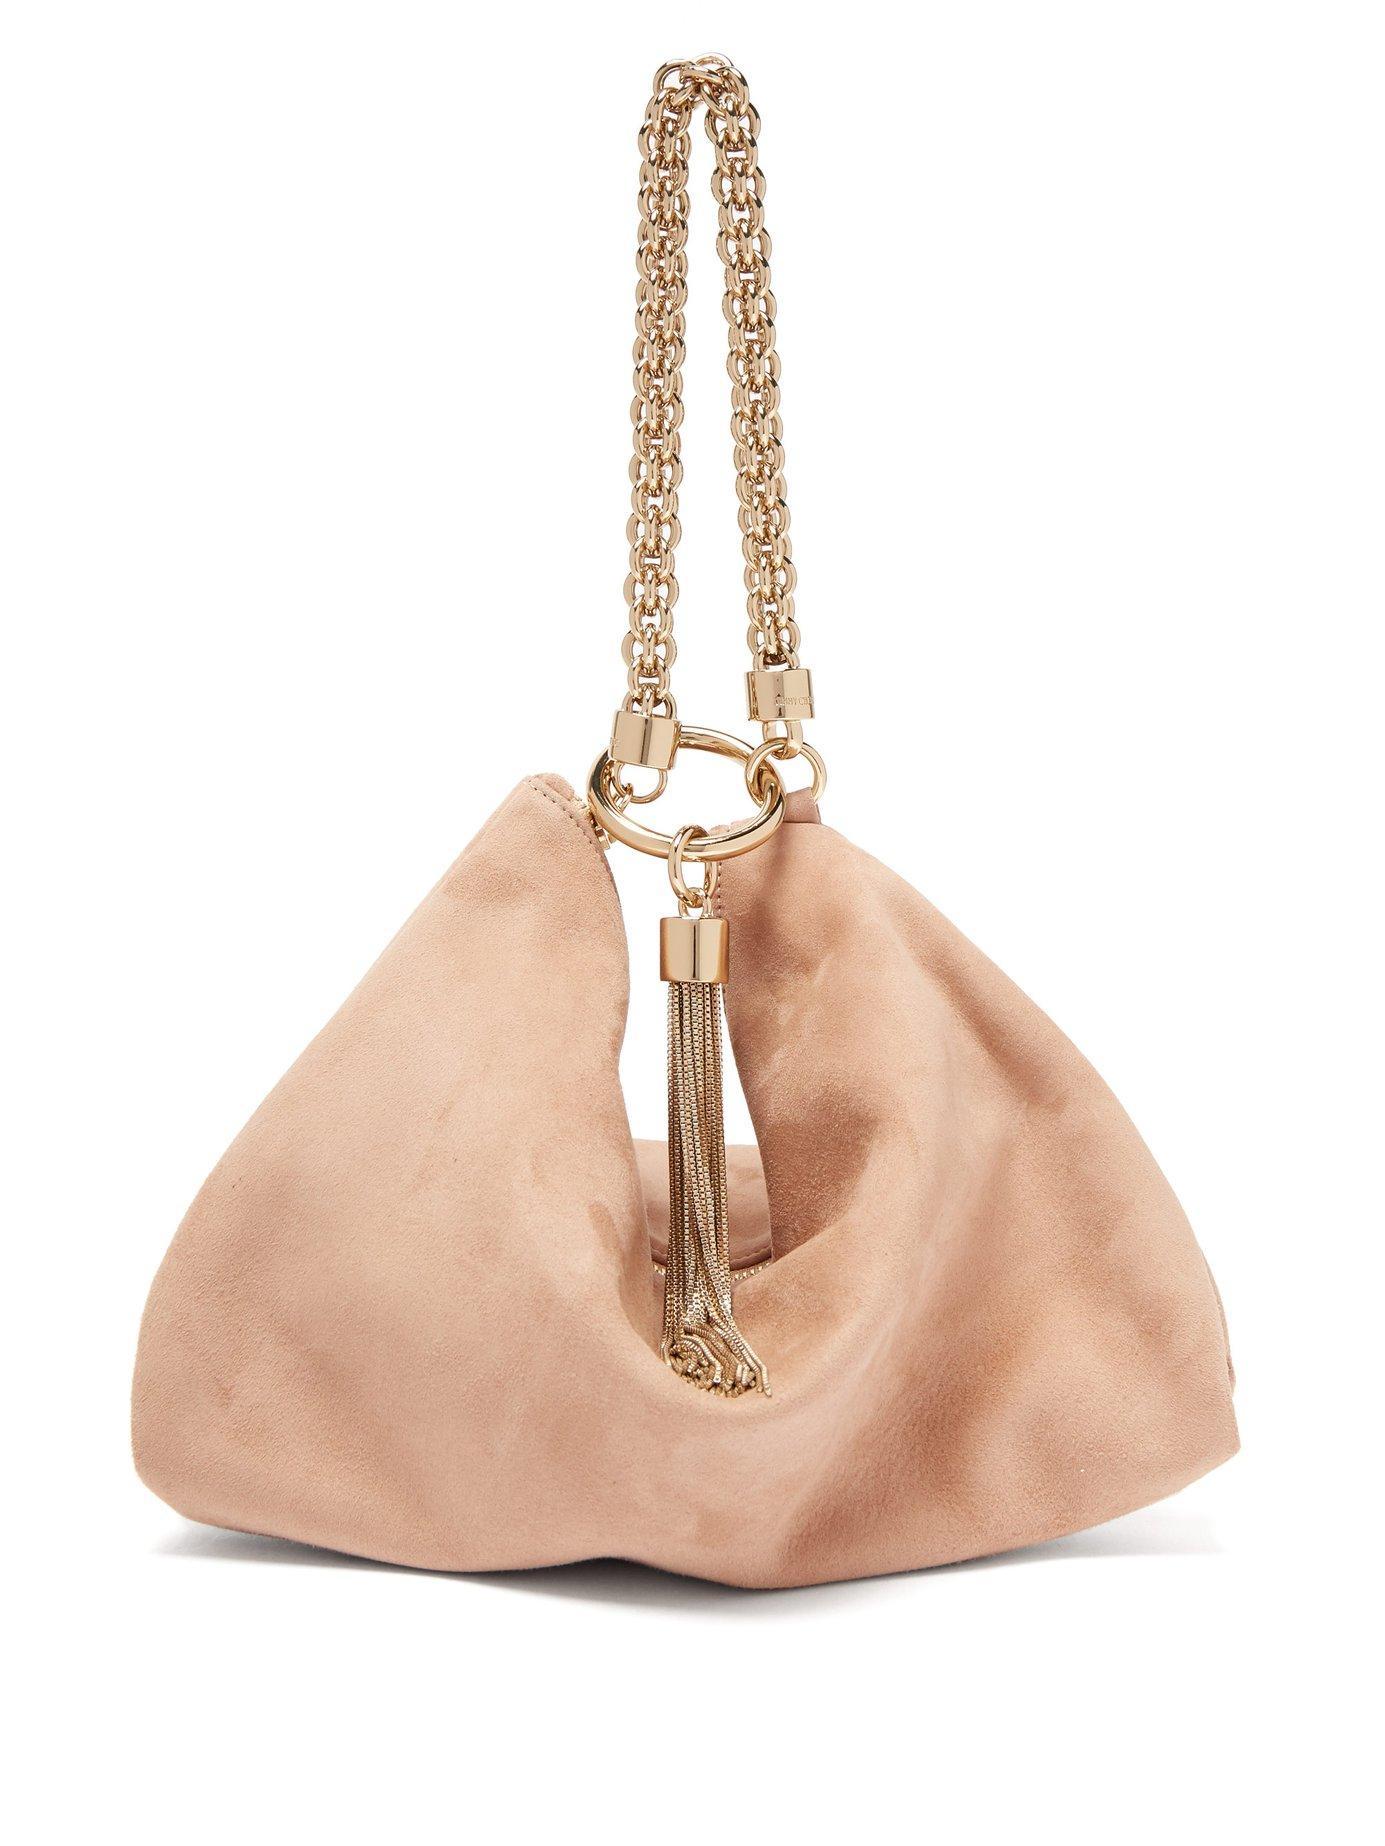 e4919a0079 Lyst - Jimmy Choo Callie Suede Clutch Bag in Pink